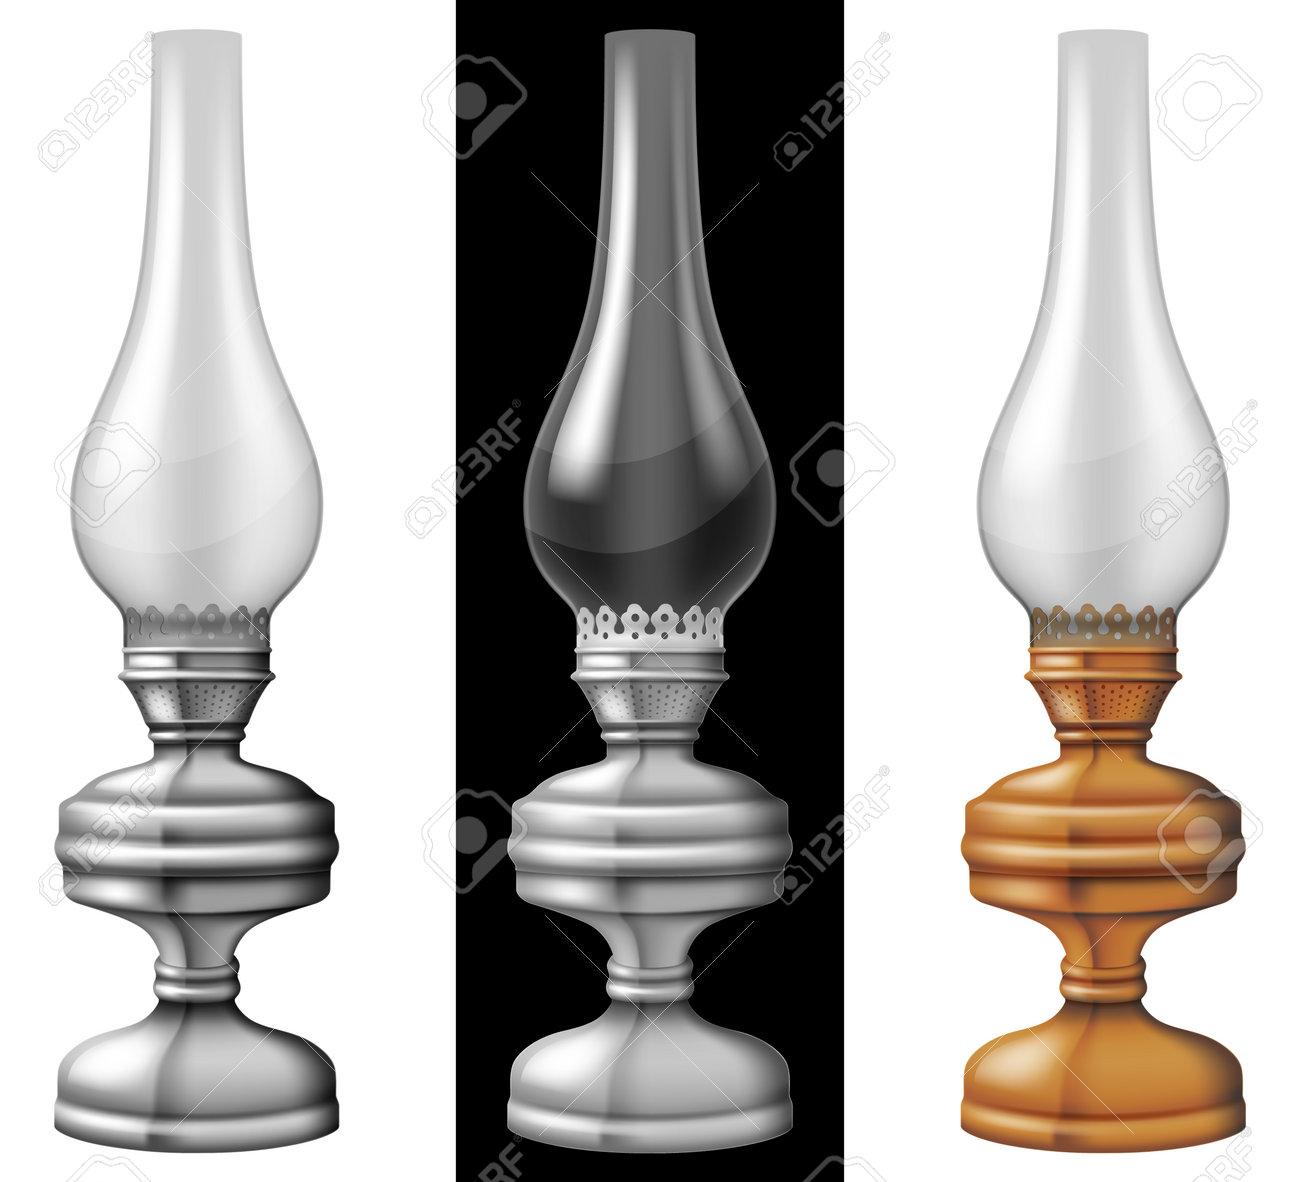 Set of three kerosene / oil lanterns / lamps. Photo-realistic vector illustration. - 162640553